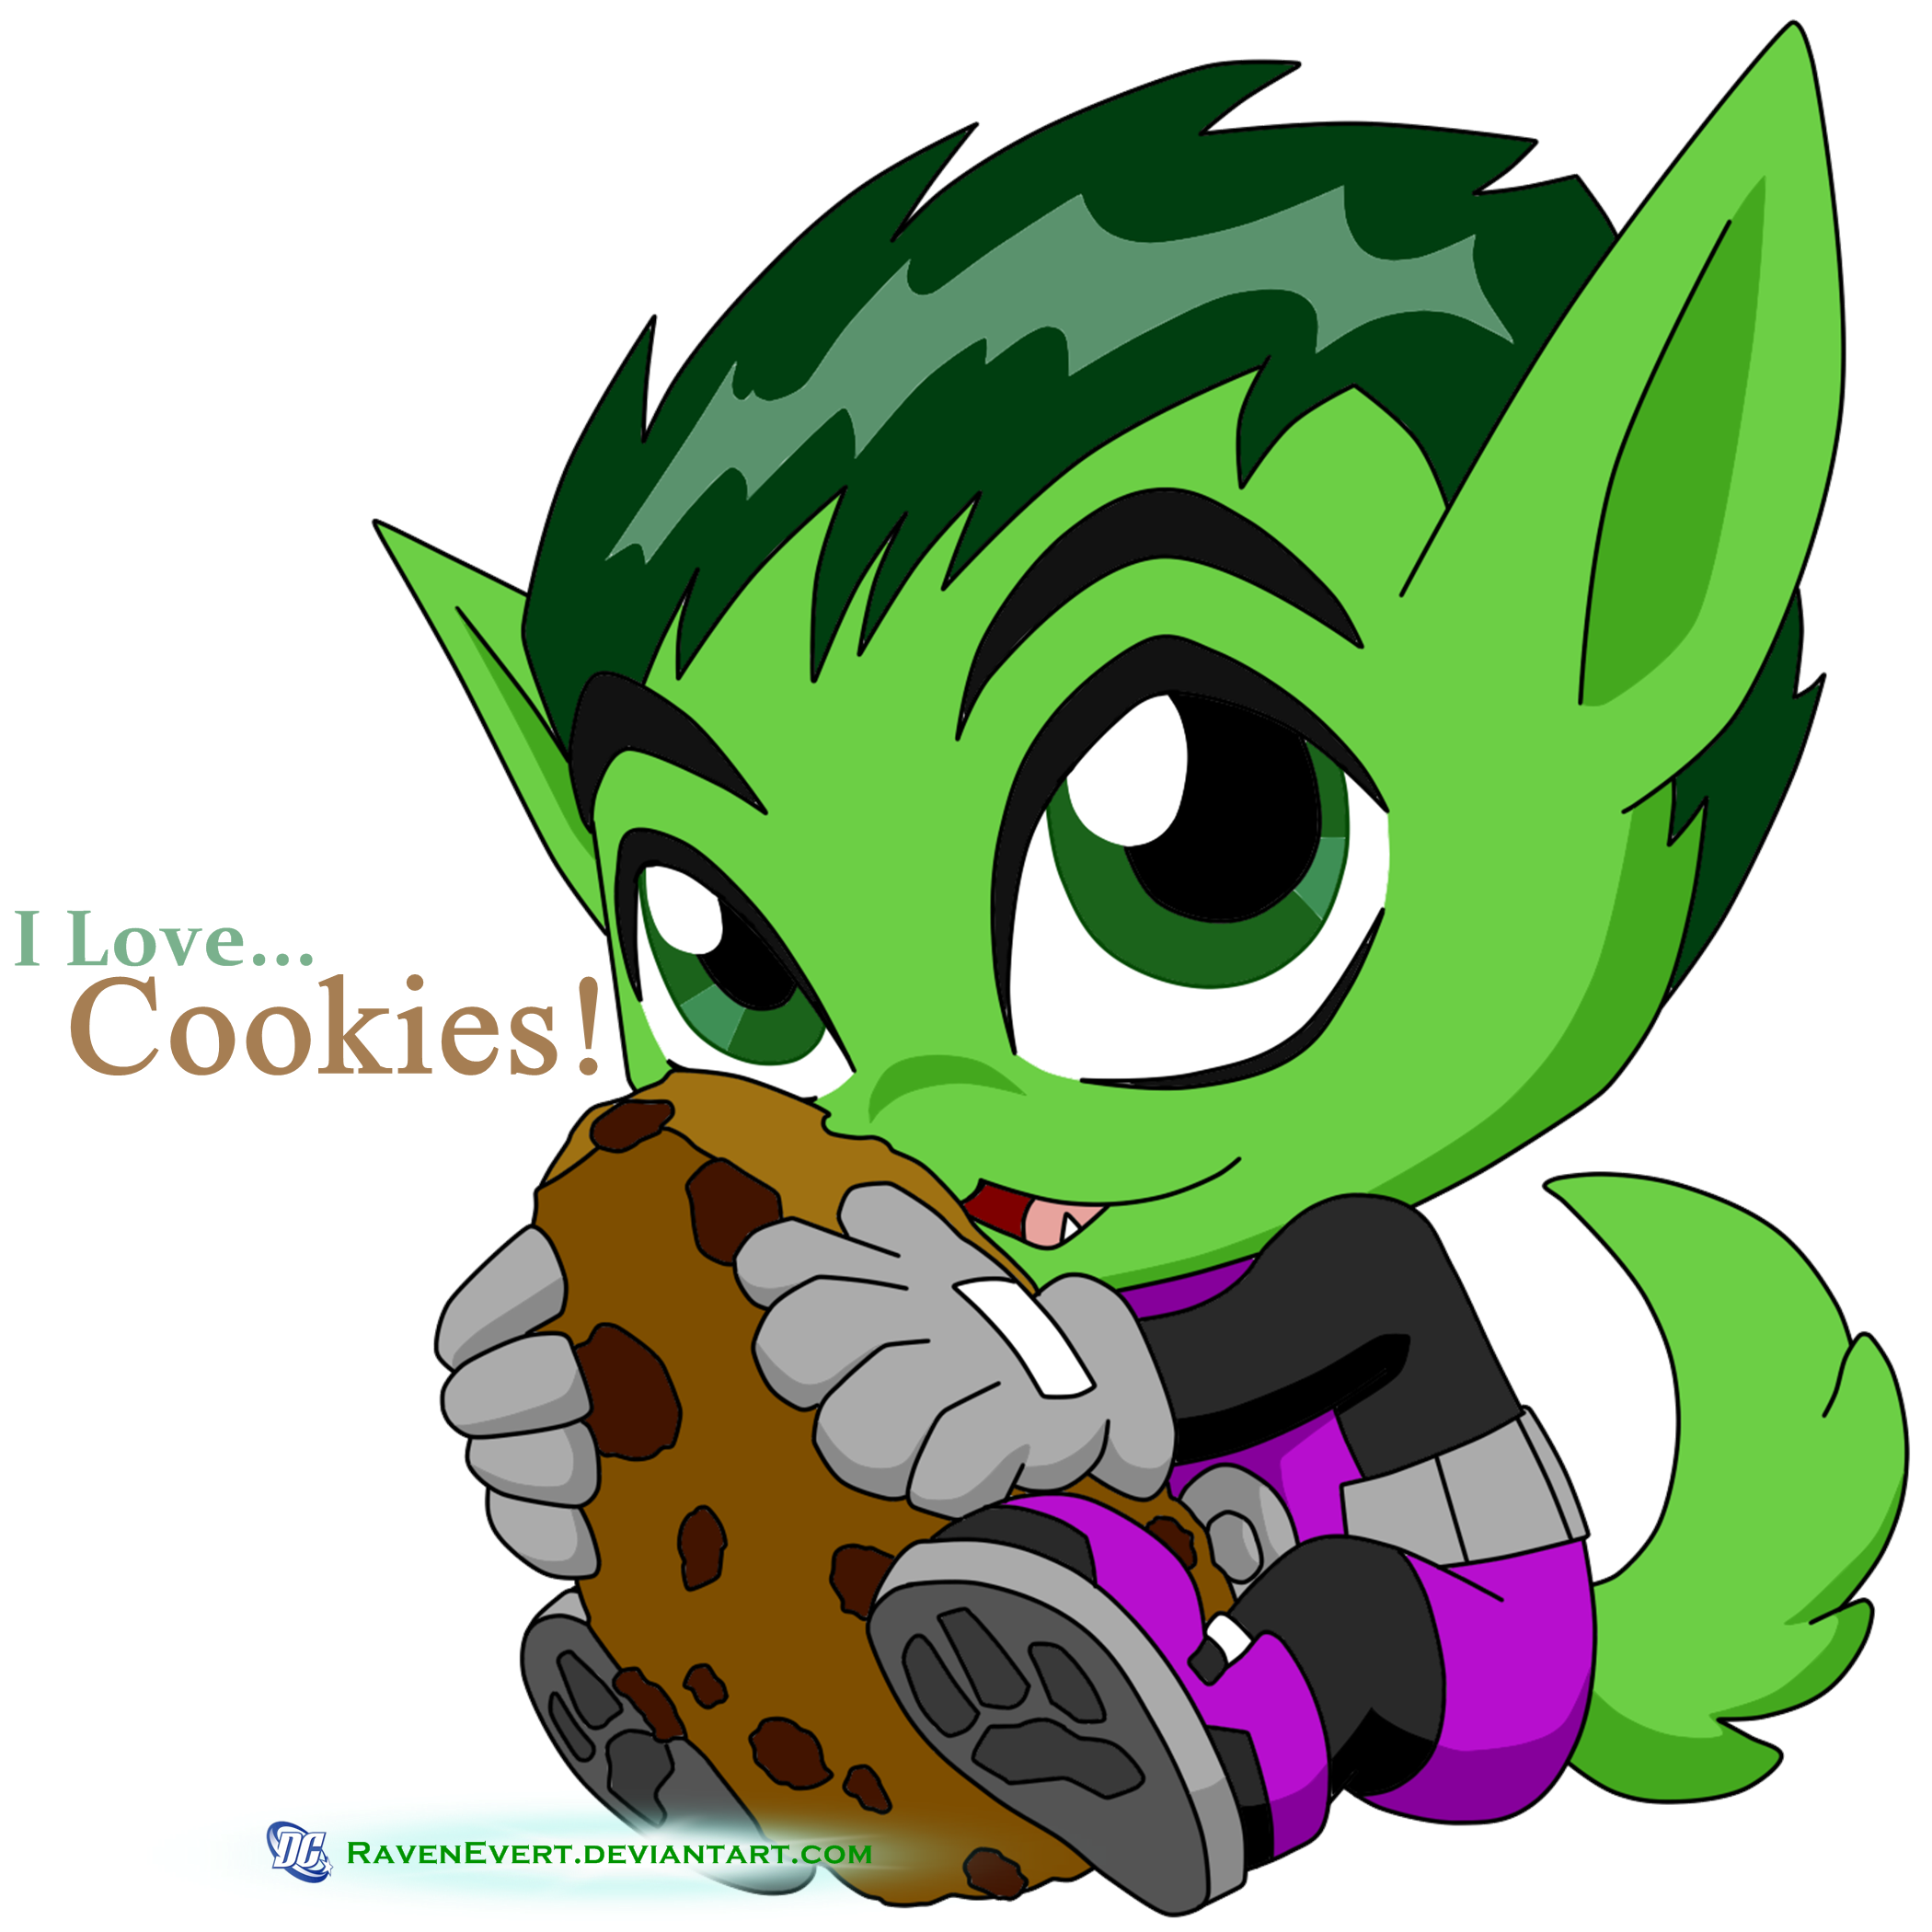 I Love Cookies! by RavenEvert